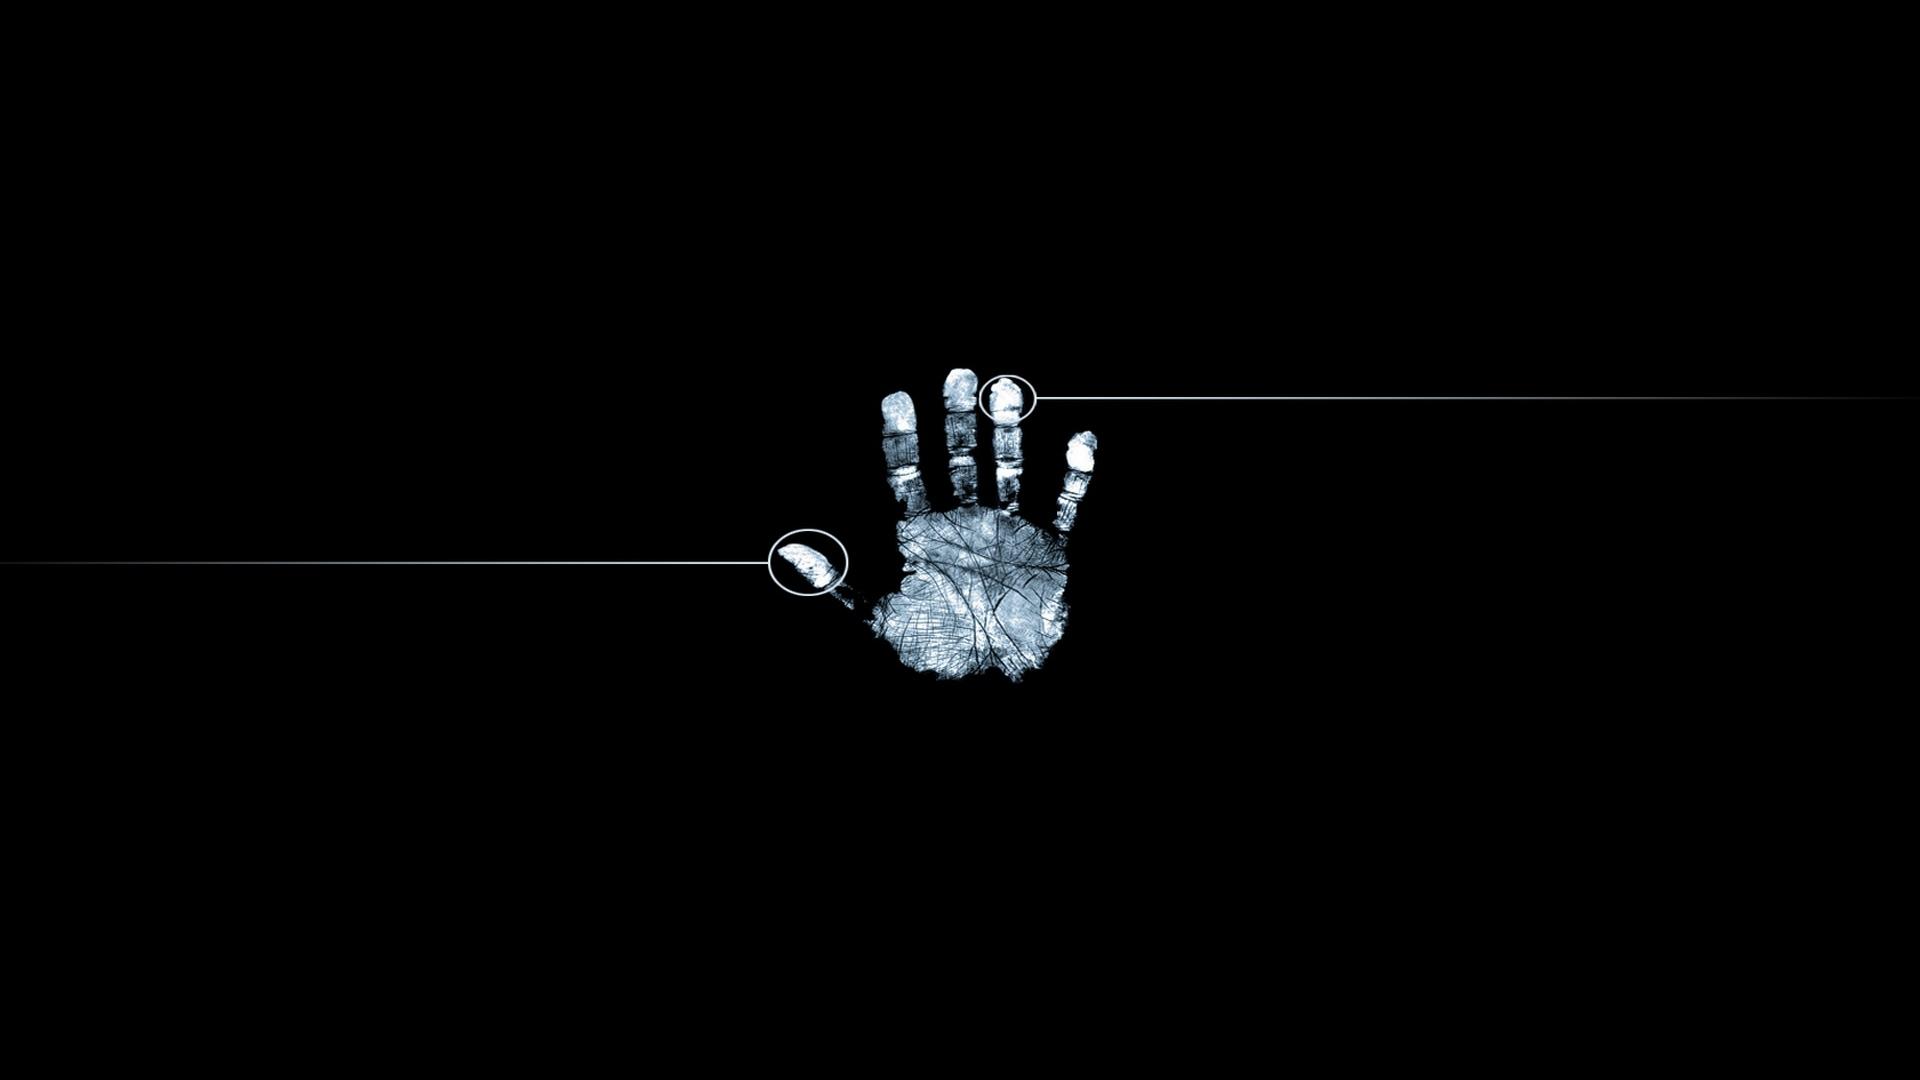 Free Download Wallpaper 1920x1080 Fingerprint Hand Black